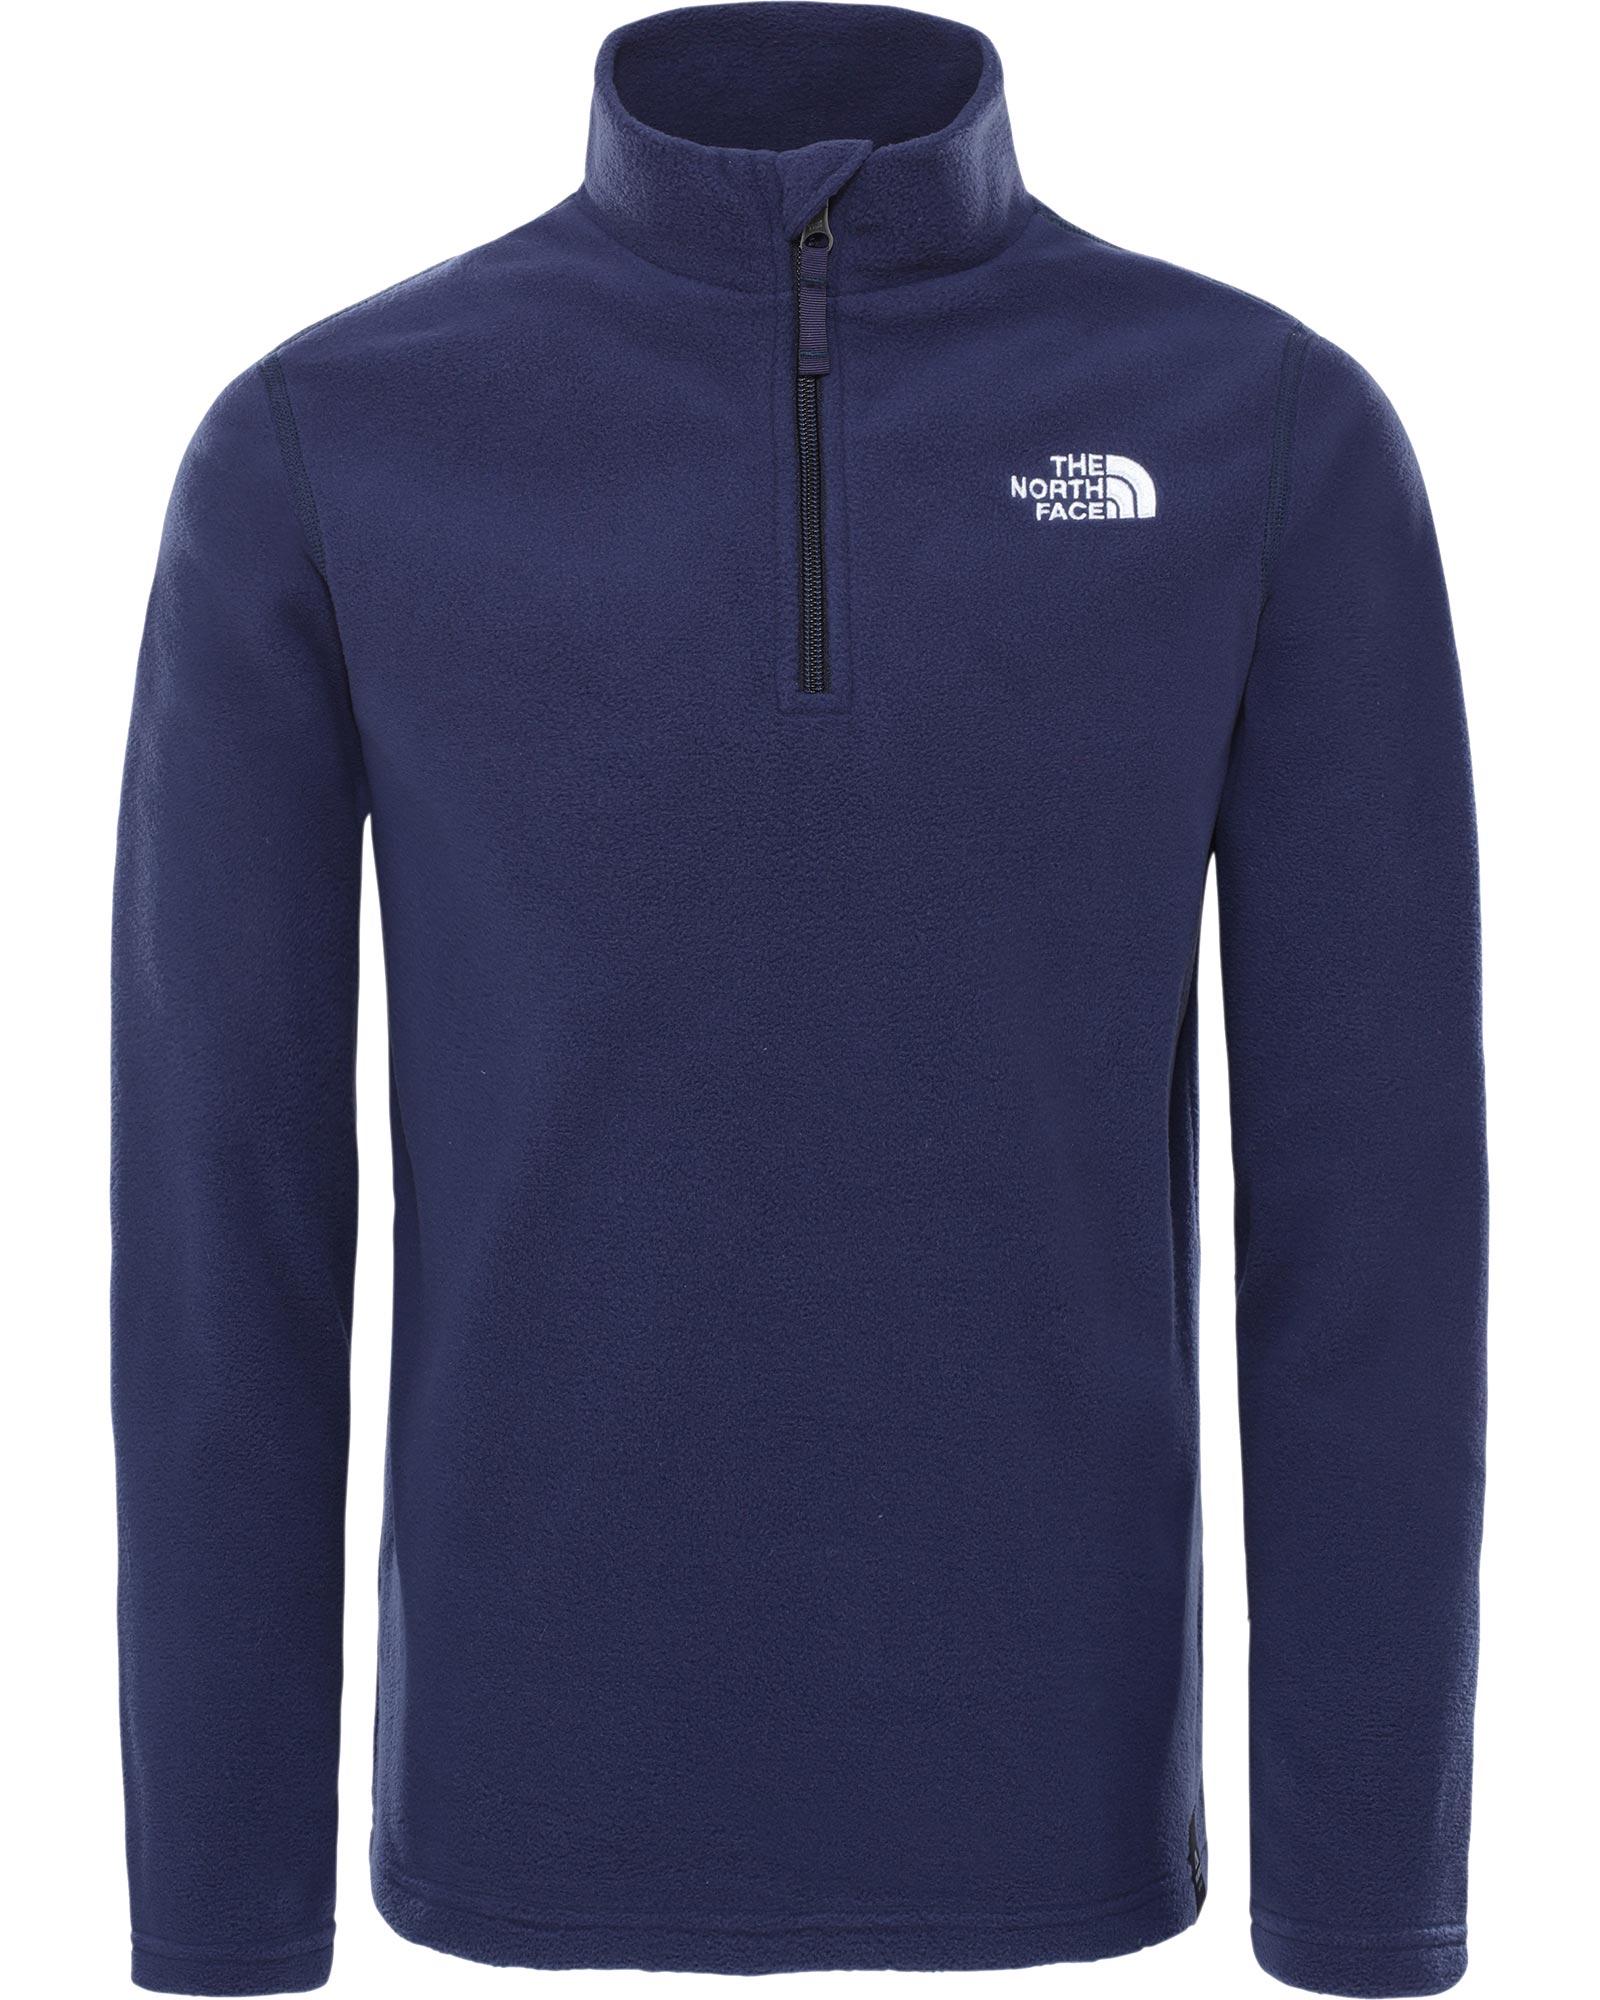 Product image of The North Face Glacier Kids' Zip Neck Fleece XL